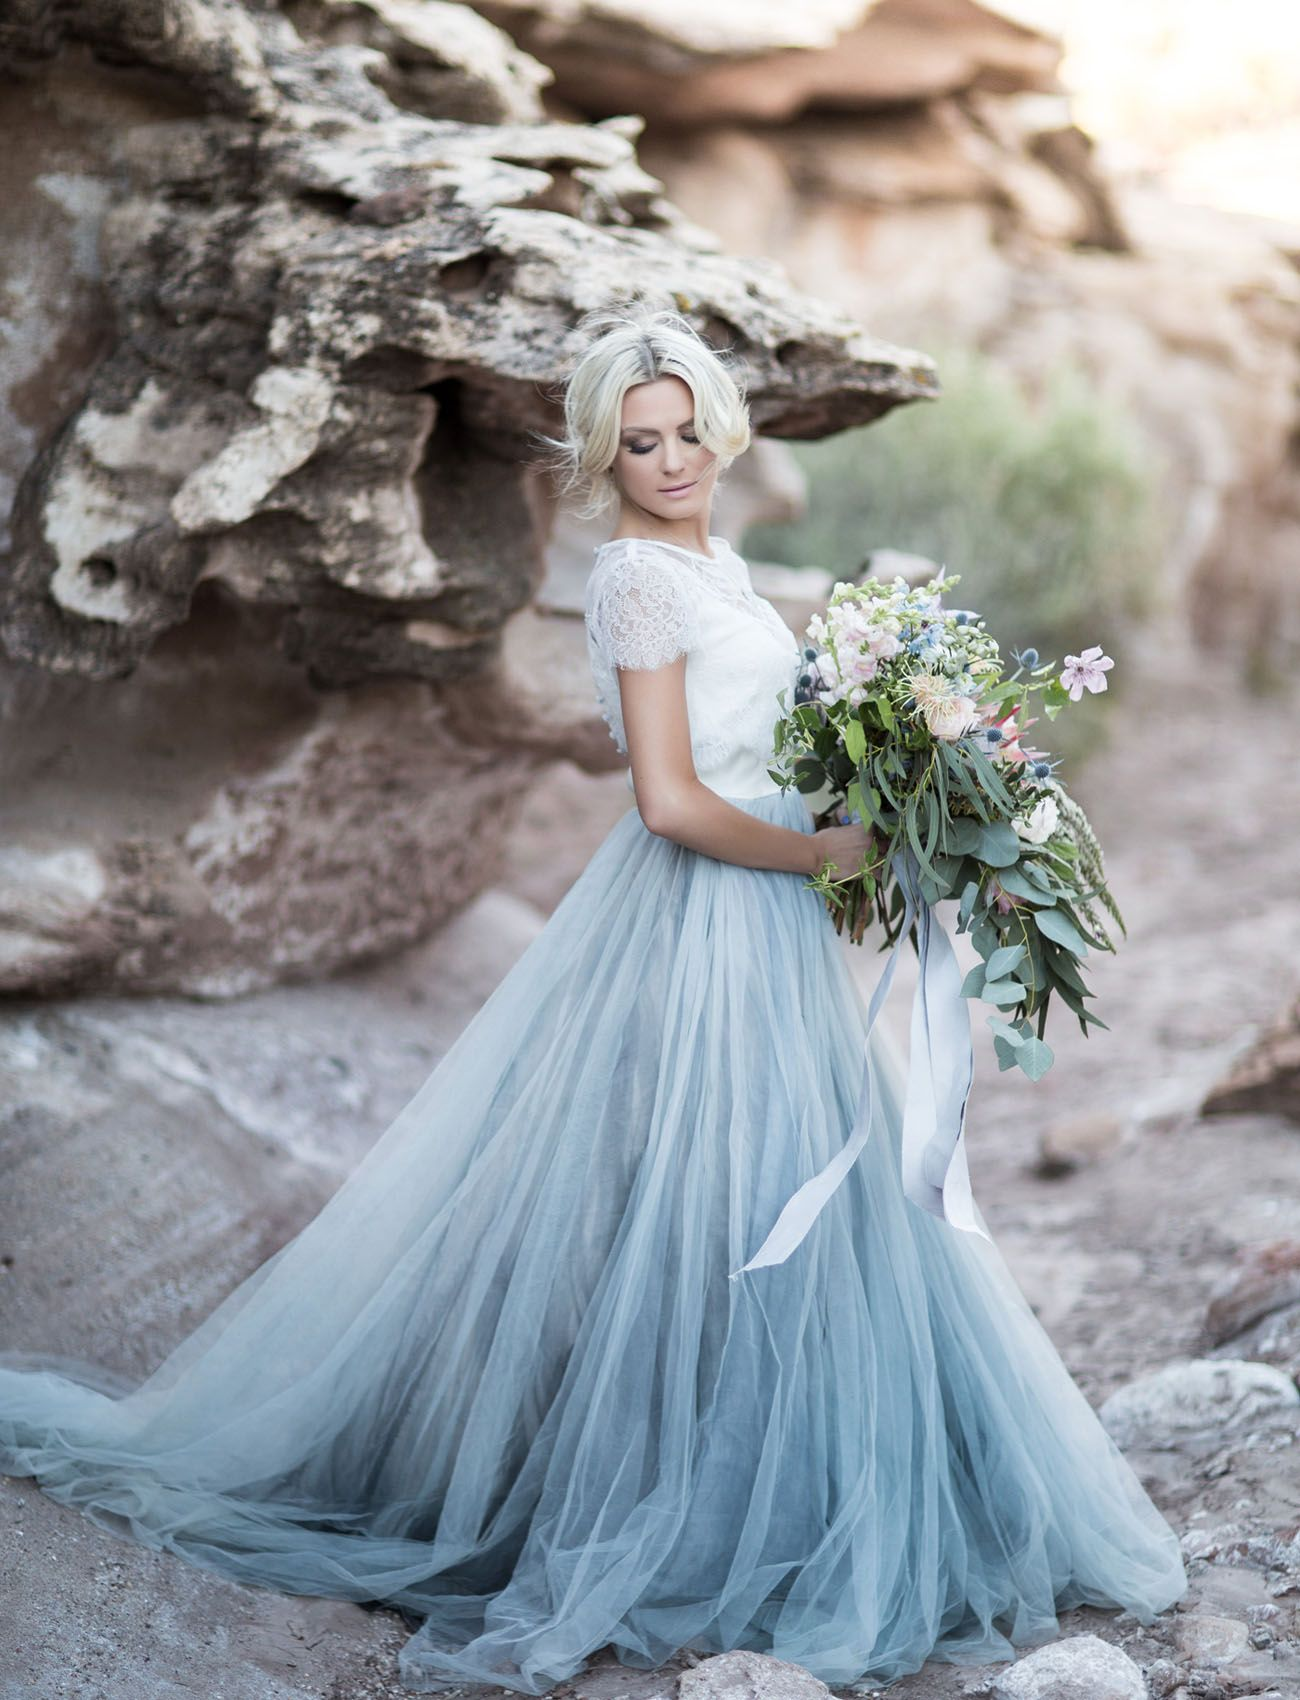 Desert wedding inspiration at zion national park vestidos boda